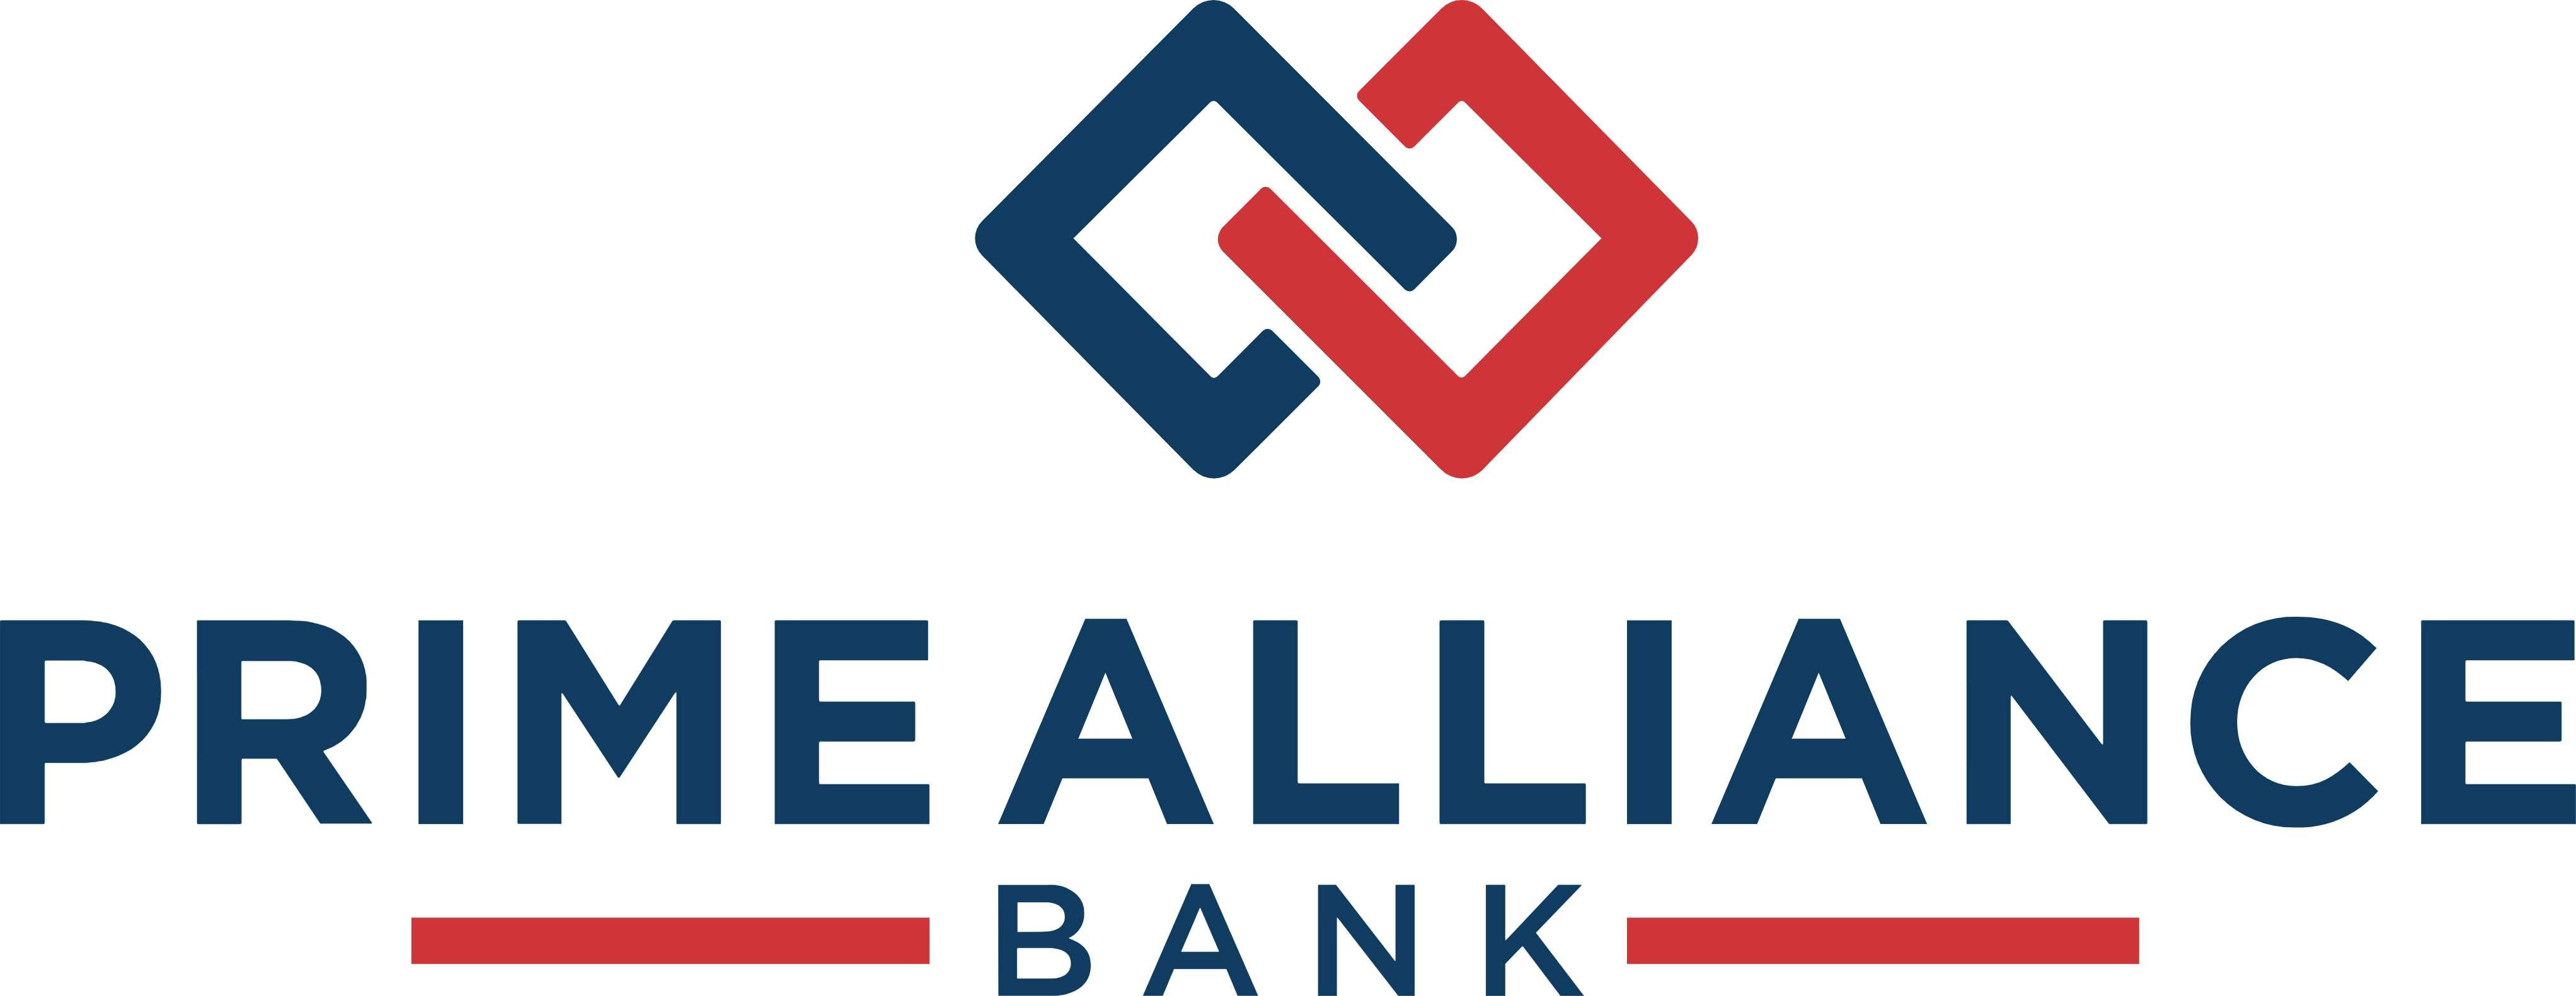 Prime Alliance Bank